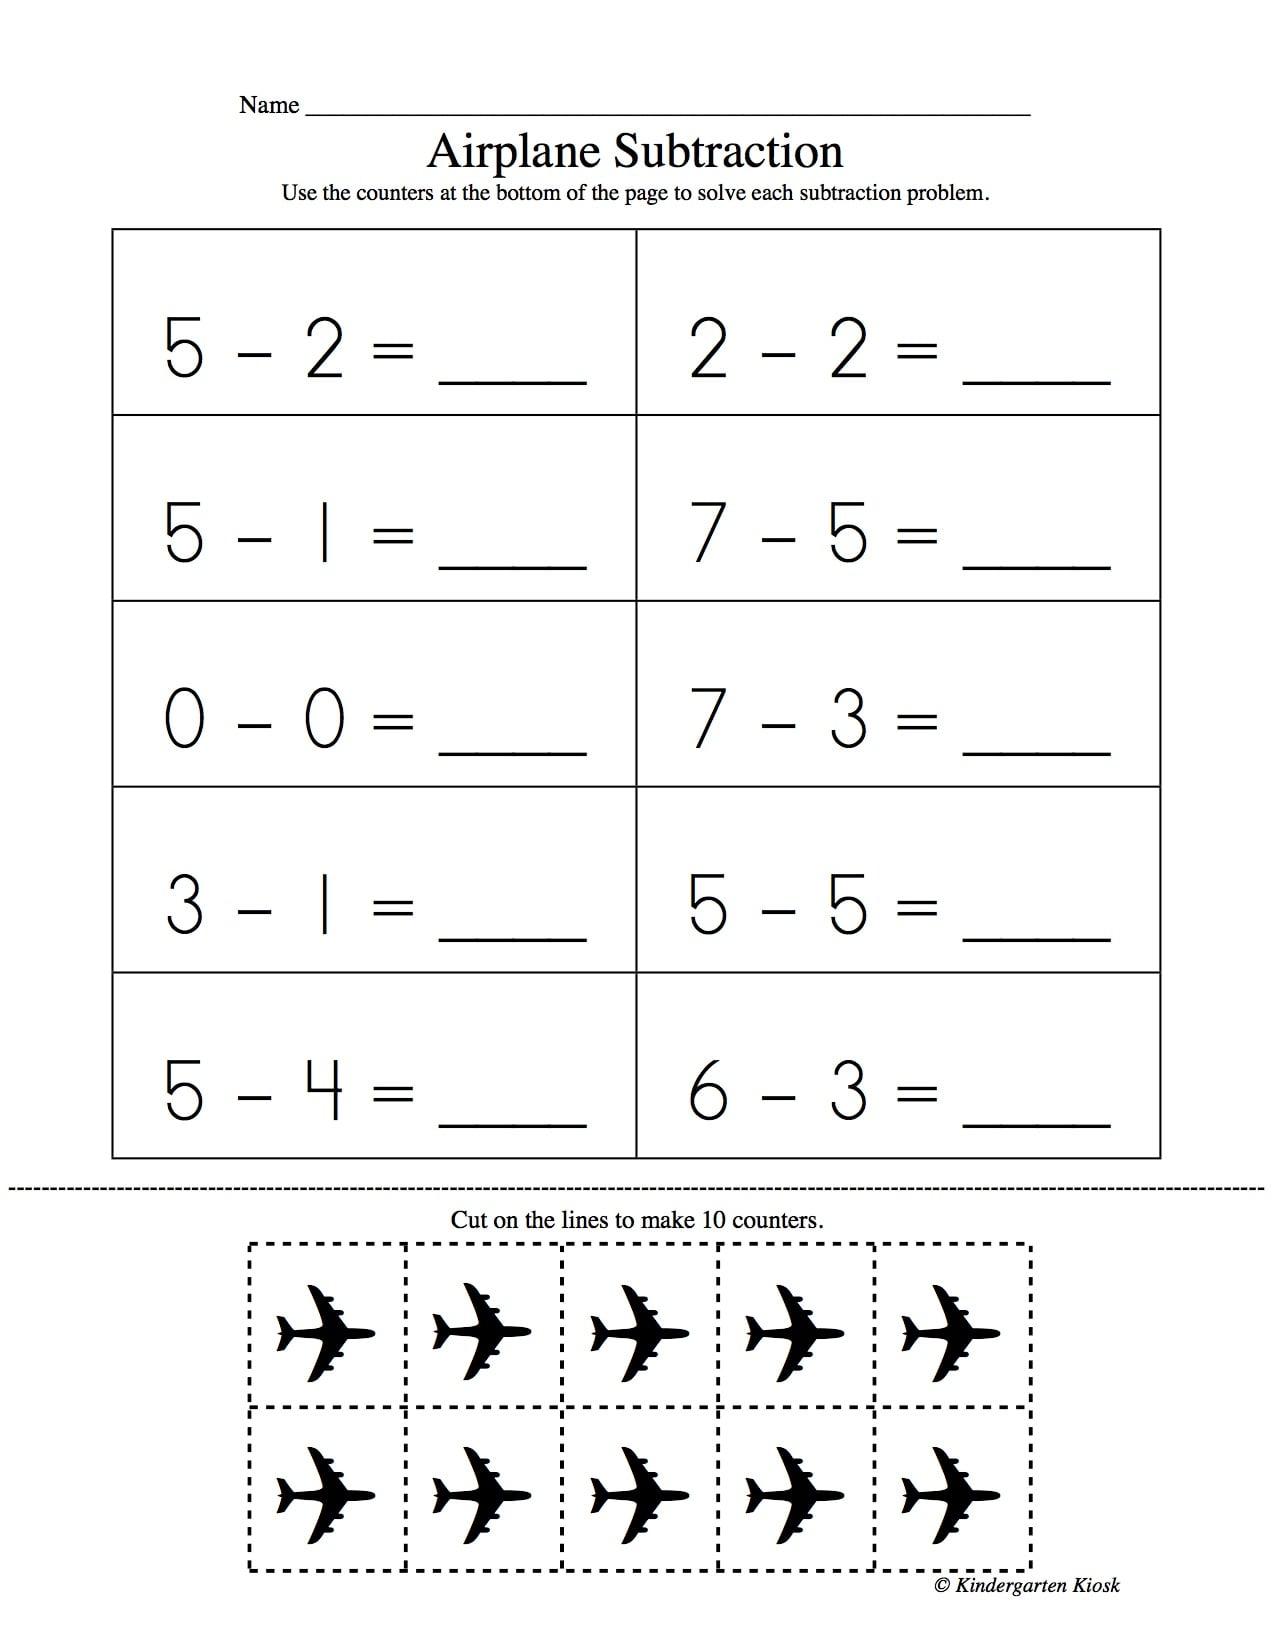 hight resolution of Subtraction Worksheets for Kindergarten — Kindergarten Kiosk